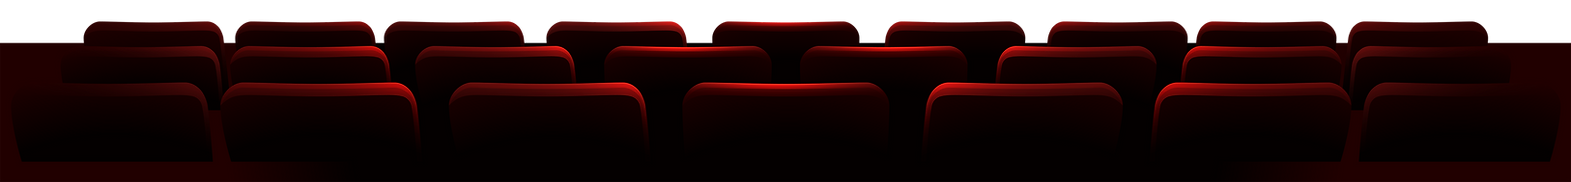 Cinema_Seats_PNG_Clip_Art_Image-2746.png